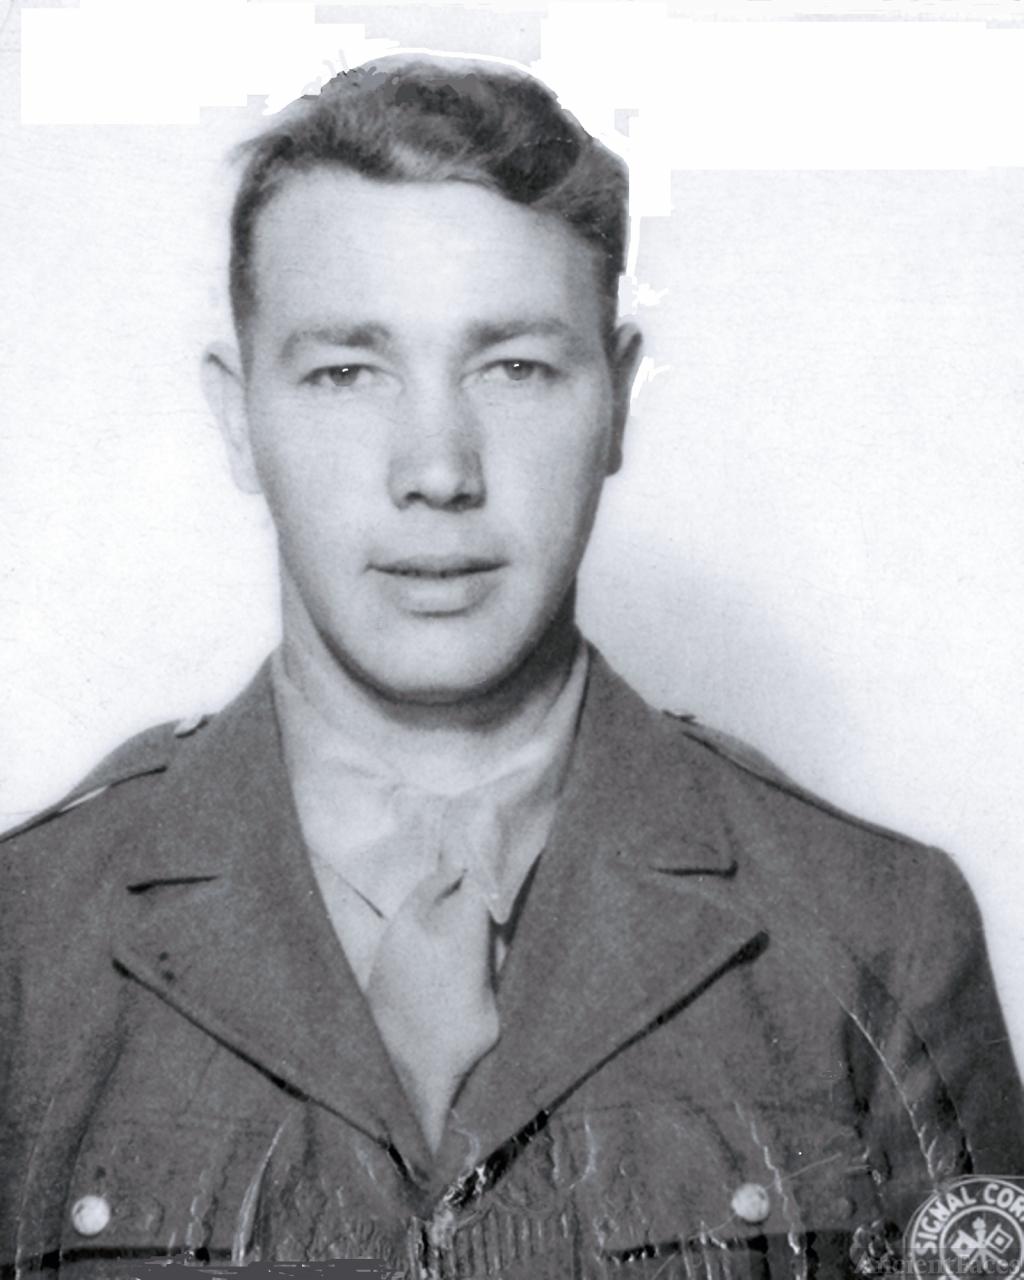 Haakon Svendsen, Army